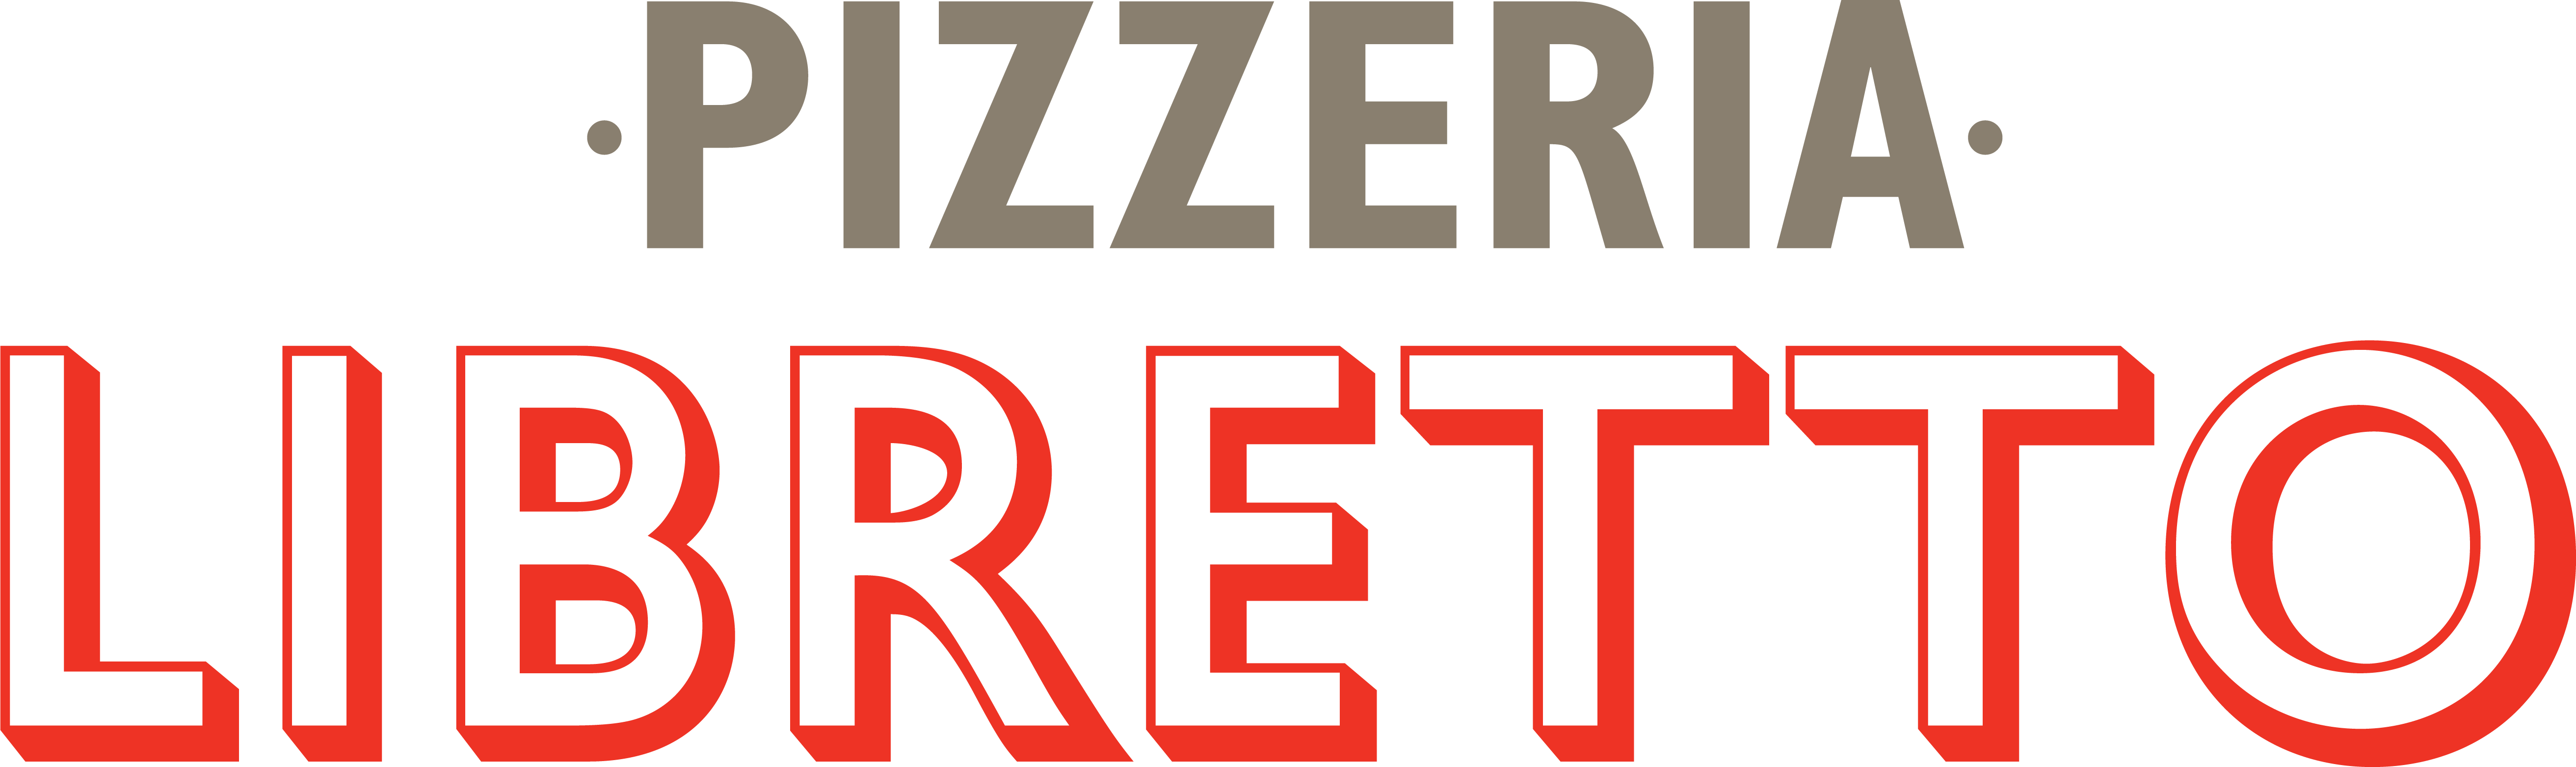 libretto_logo_rgb